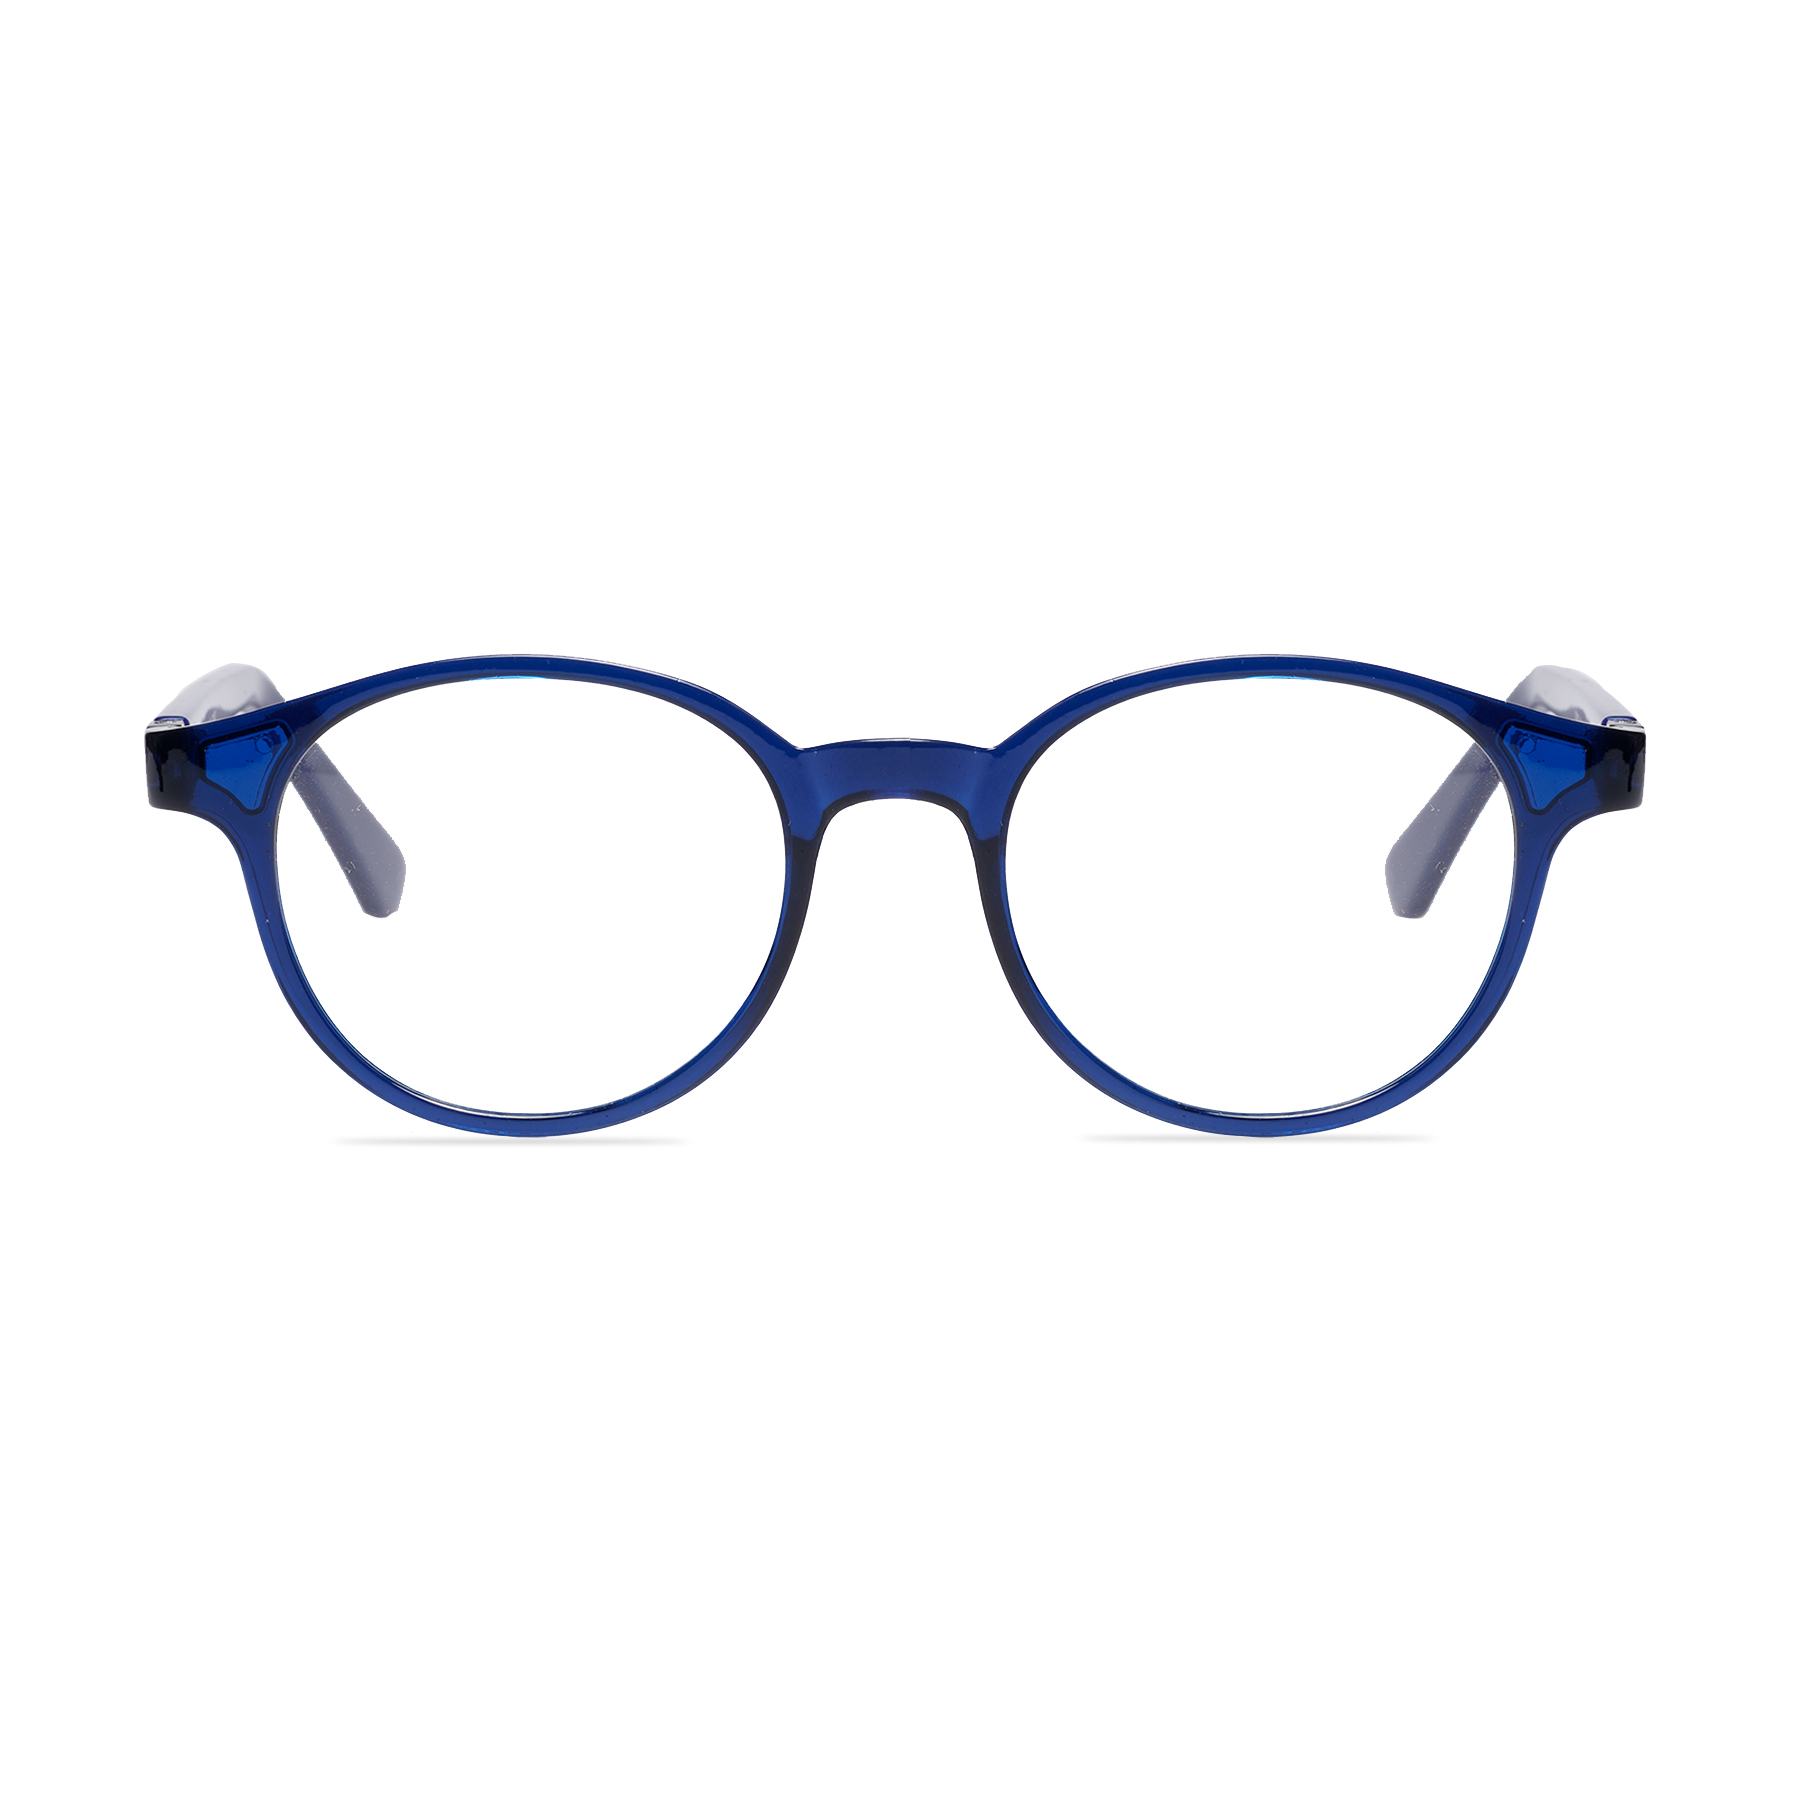 Vinaldi Plus VP007 Optical Frames